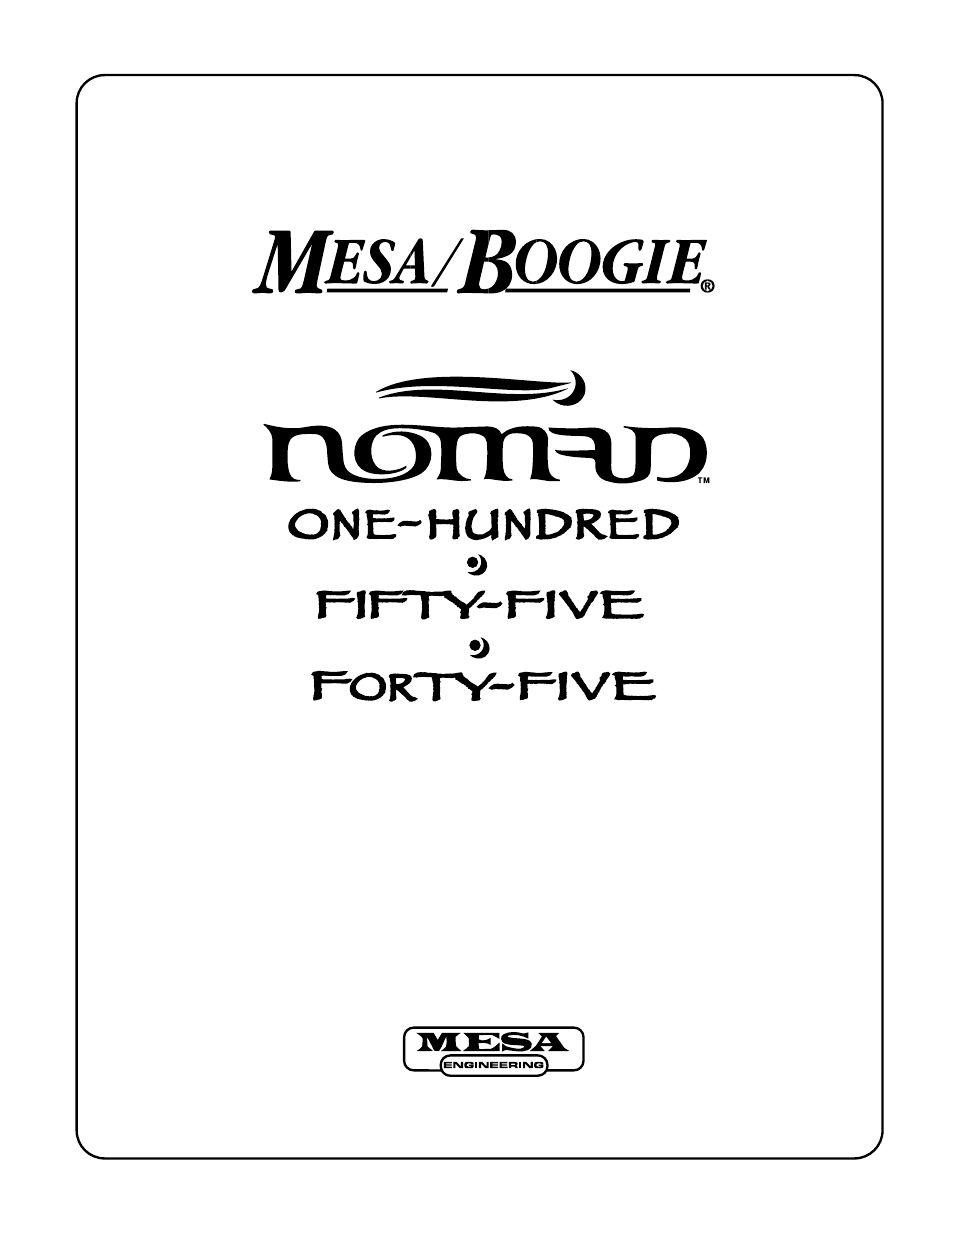 mesa boogie nomad amplifier 45 user manual 51 pages also for rh manualsdir com Mesa Boogie Wallpaper Mesa Boogie Logo